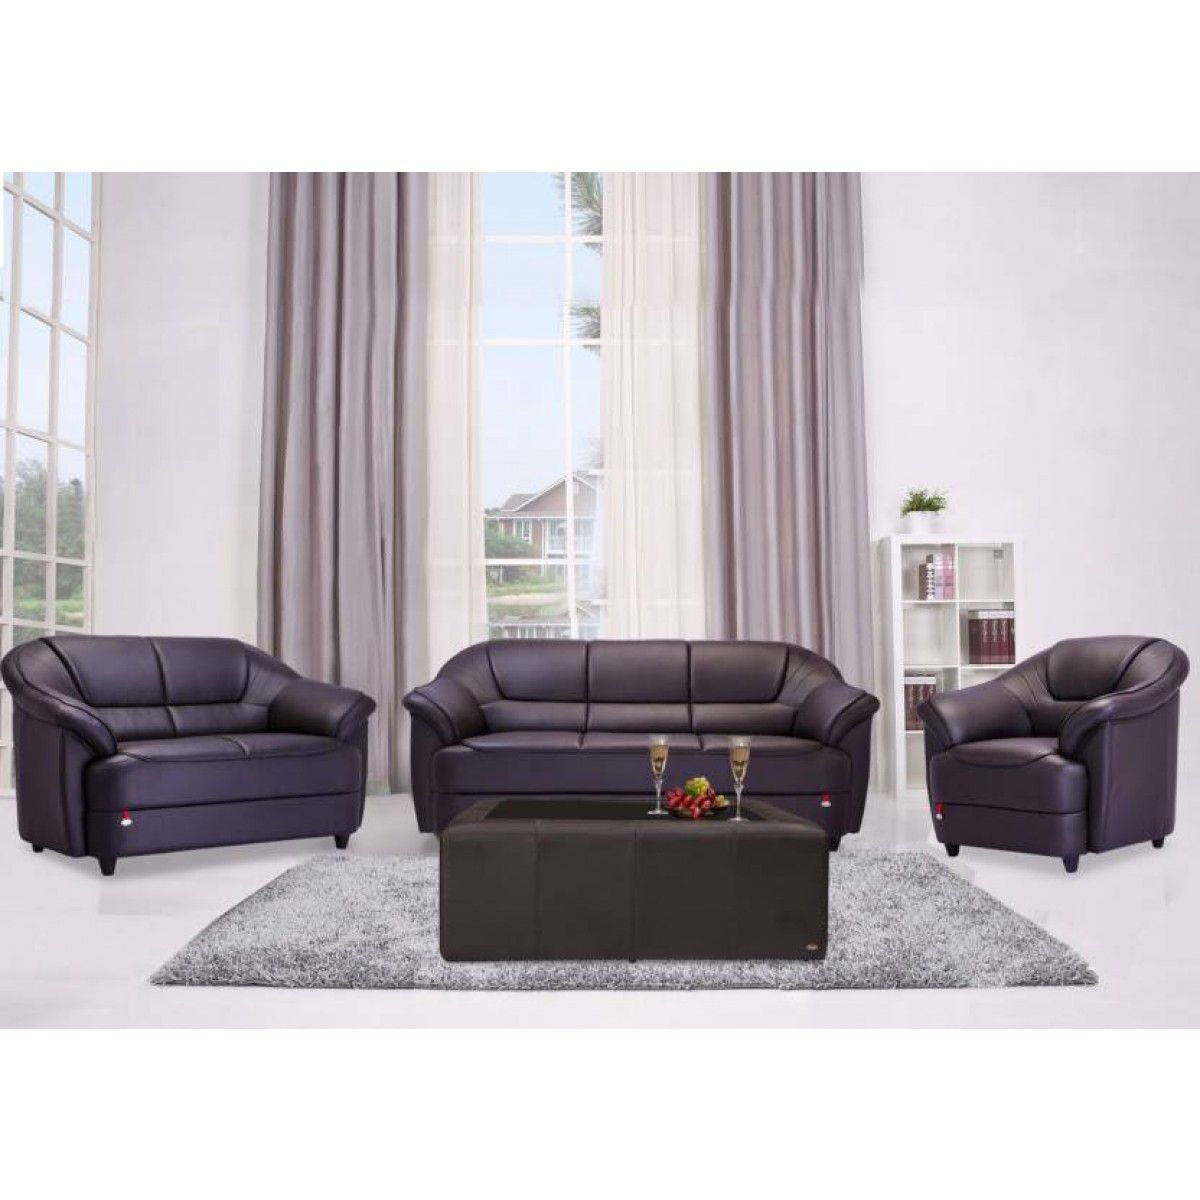 Pretty Designer Sofa Set Best Buy At Gorevizon Com This Sofa